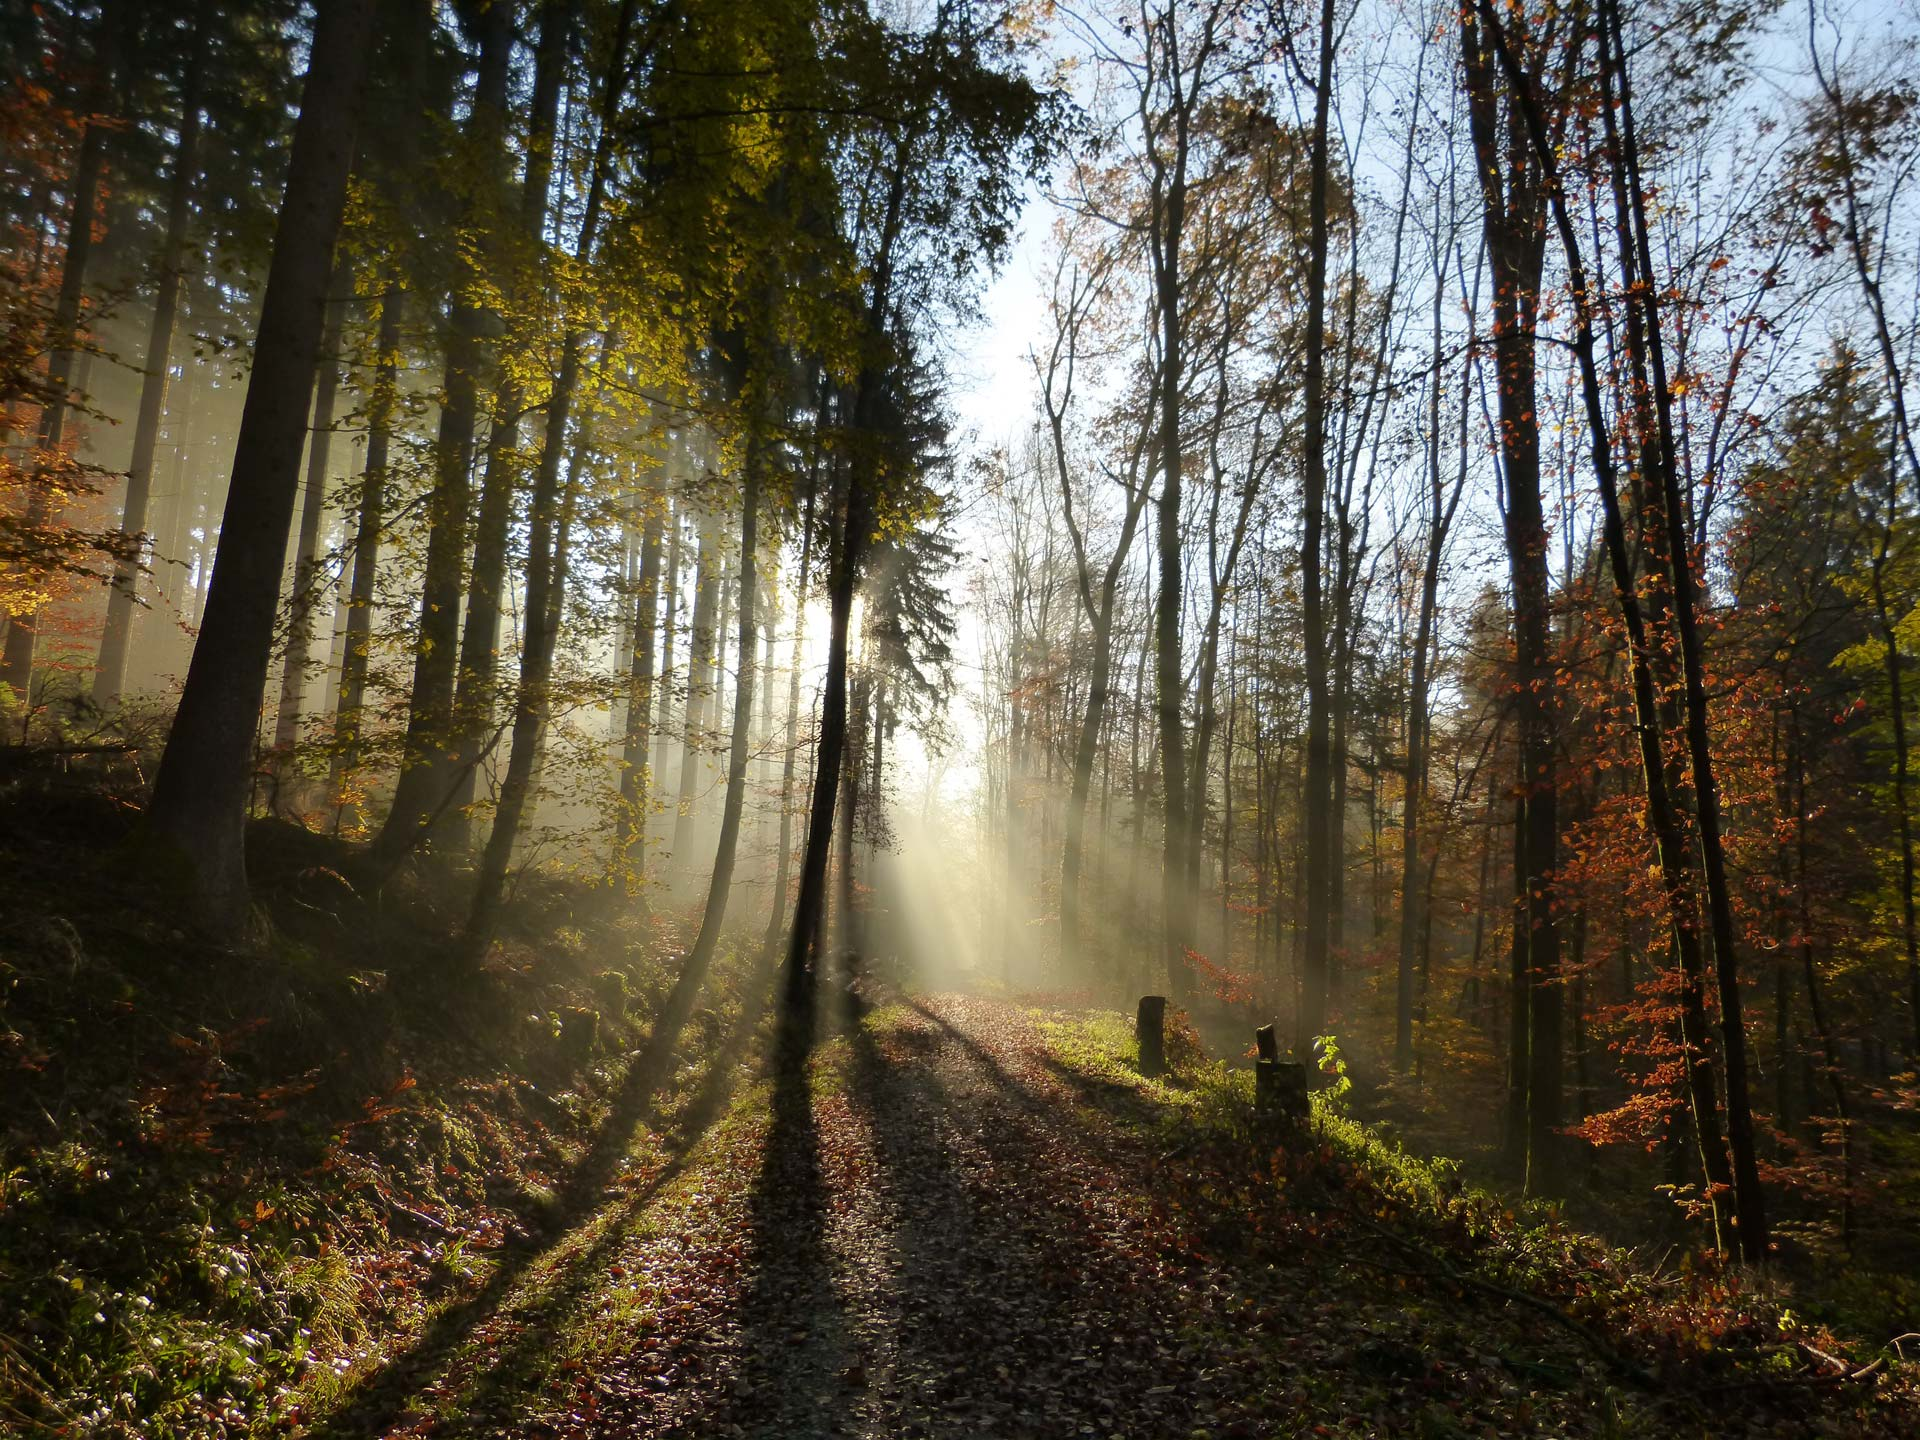 Calming Fall Wallpaper Hd Spring Walk Relaxing Nature Sounds Wandering Ambience